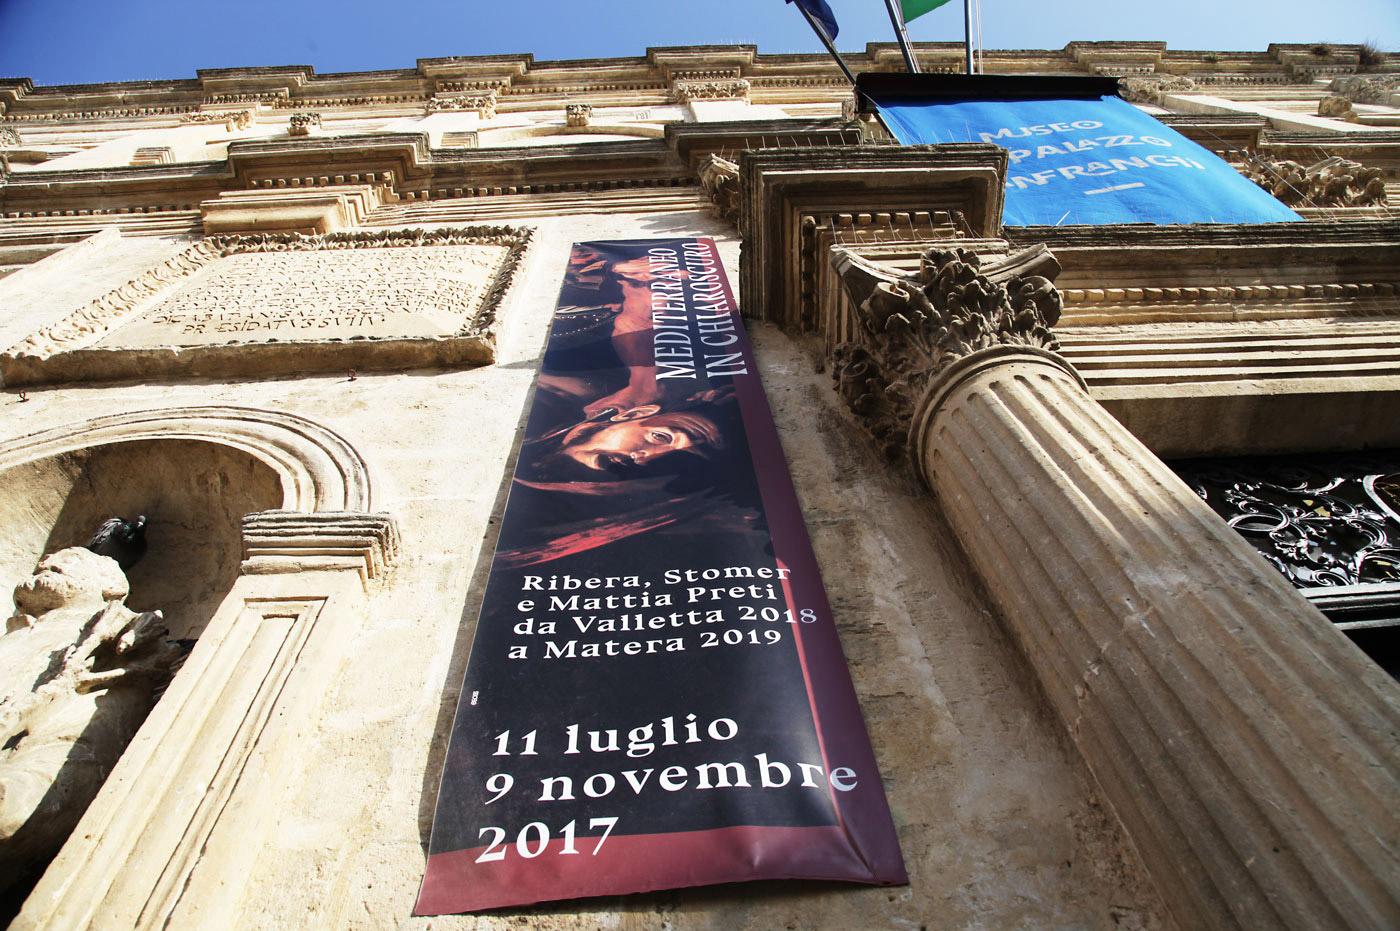 museo nazionale arte medievale e moderna ego55